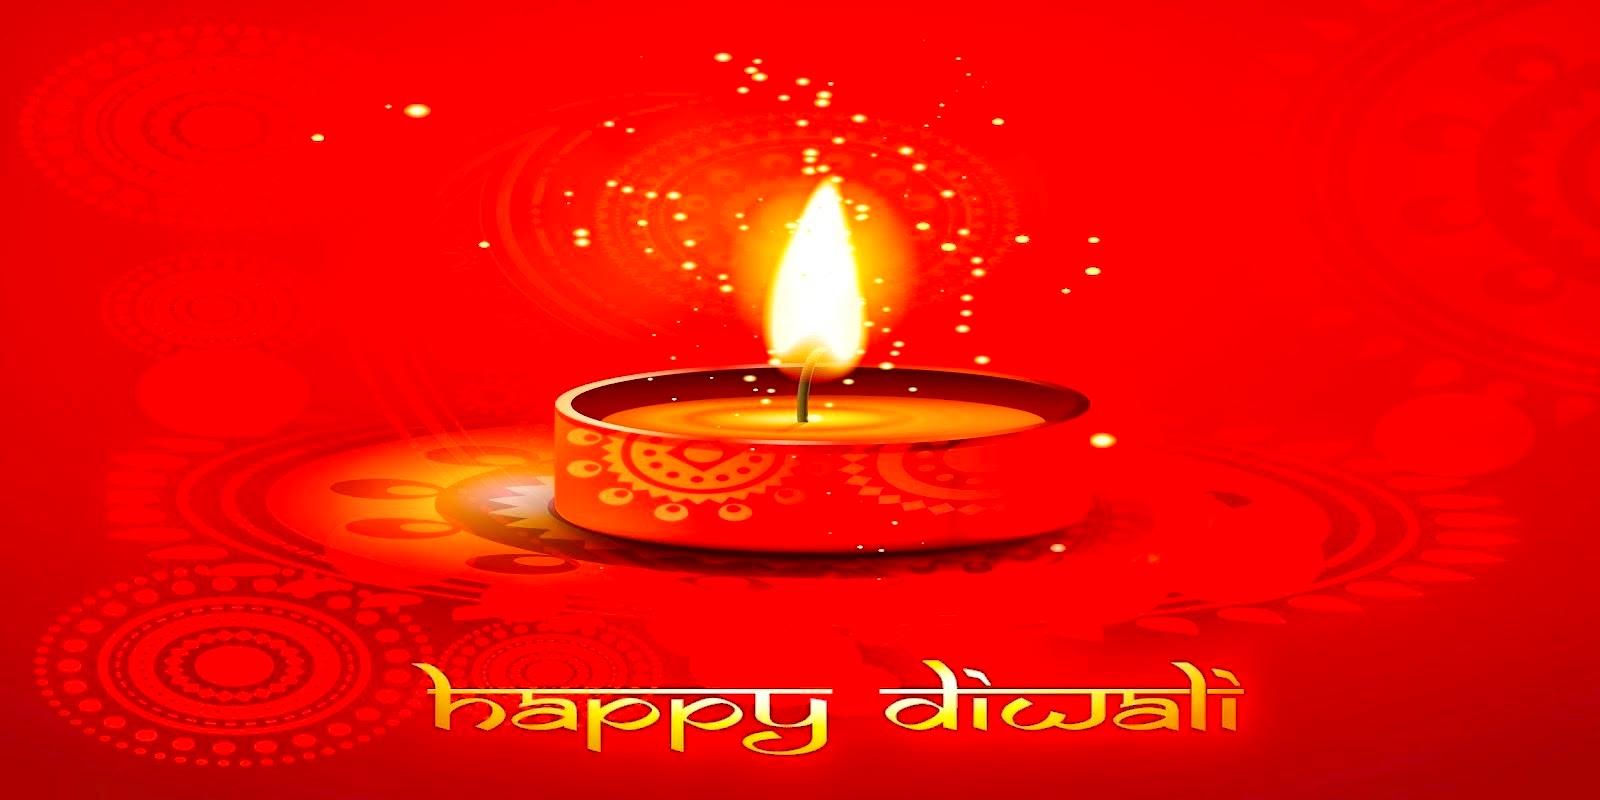 Happy Diwali Wallpapers 2014 for Desktop free